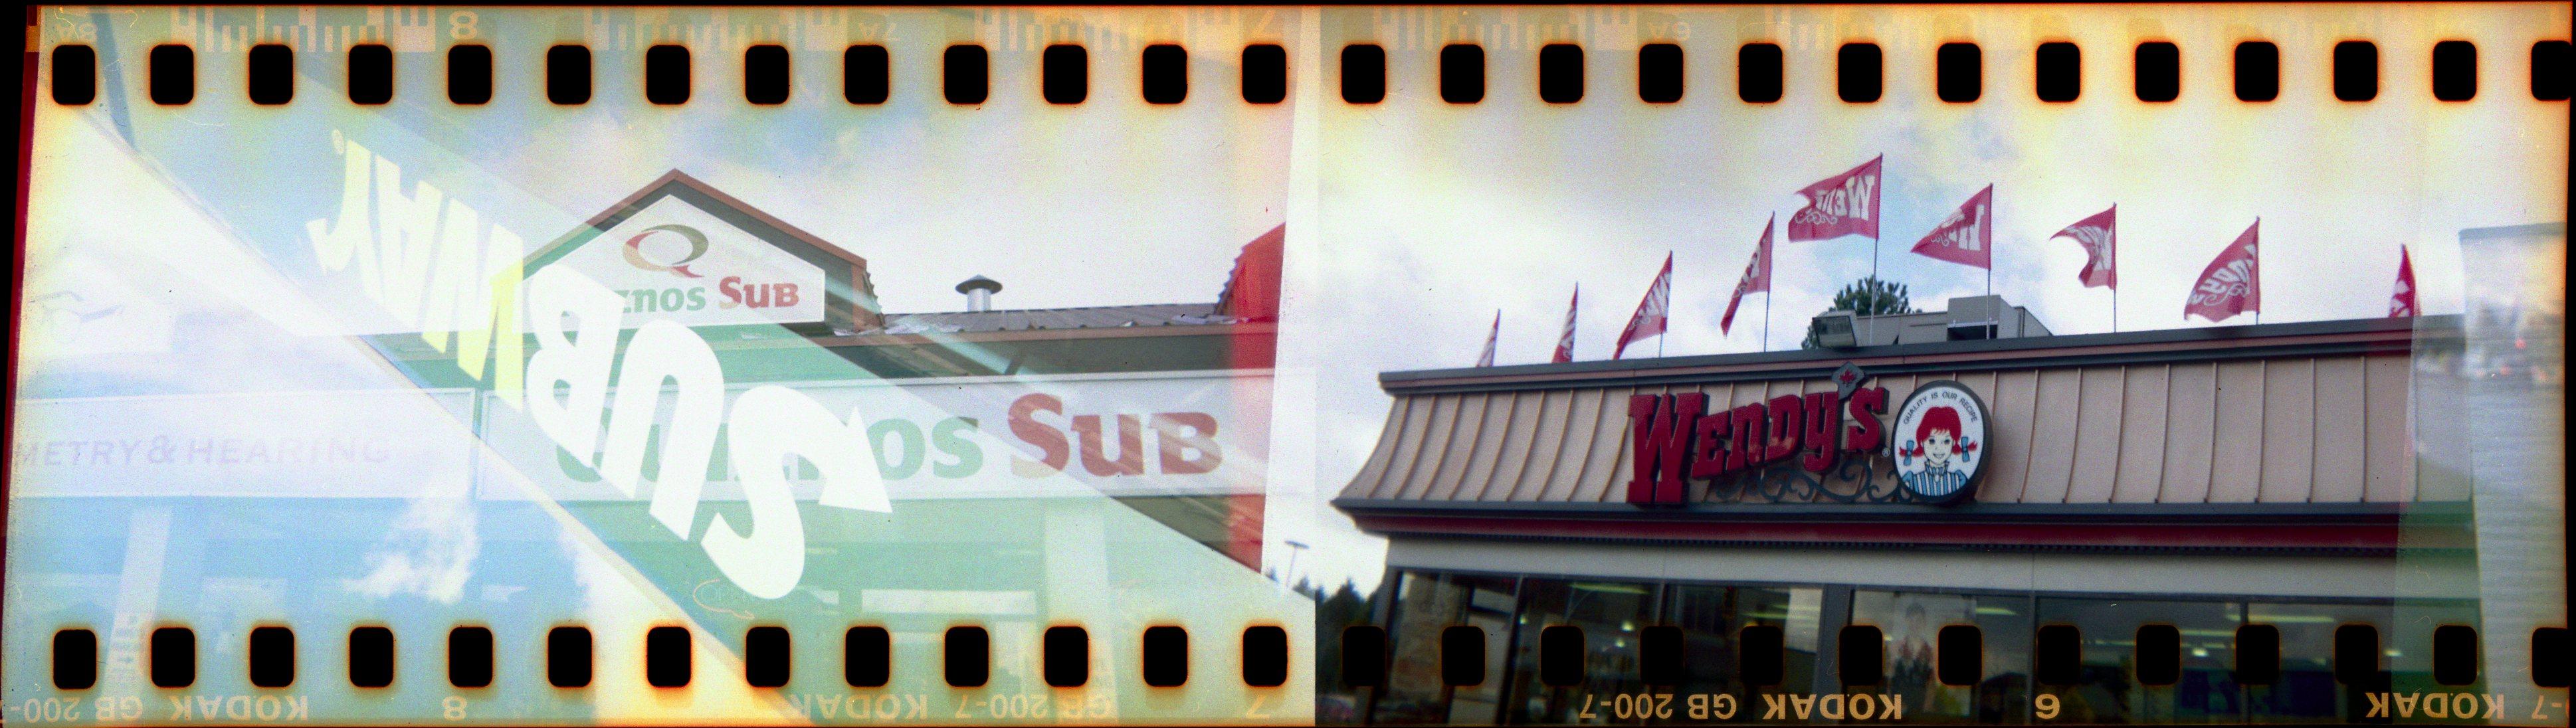 Free Images : restaurant, advertising, subway, food